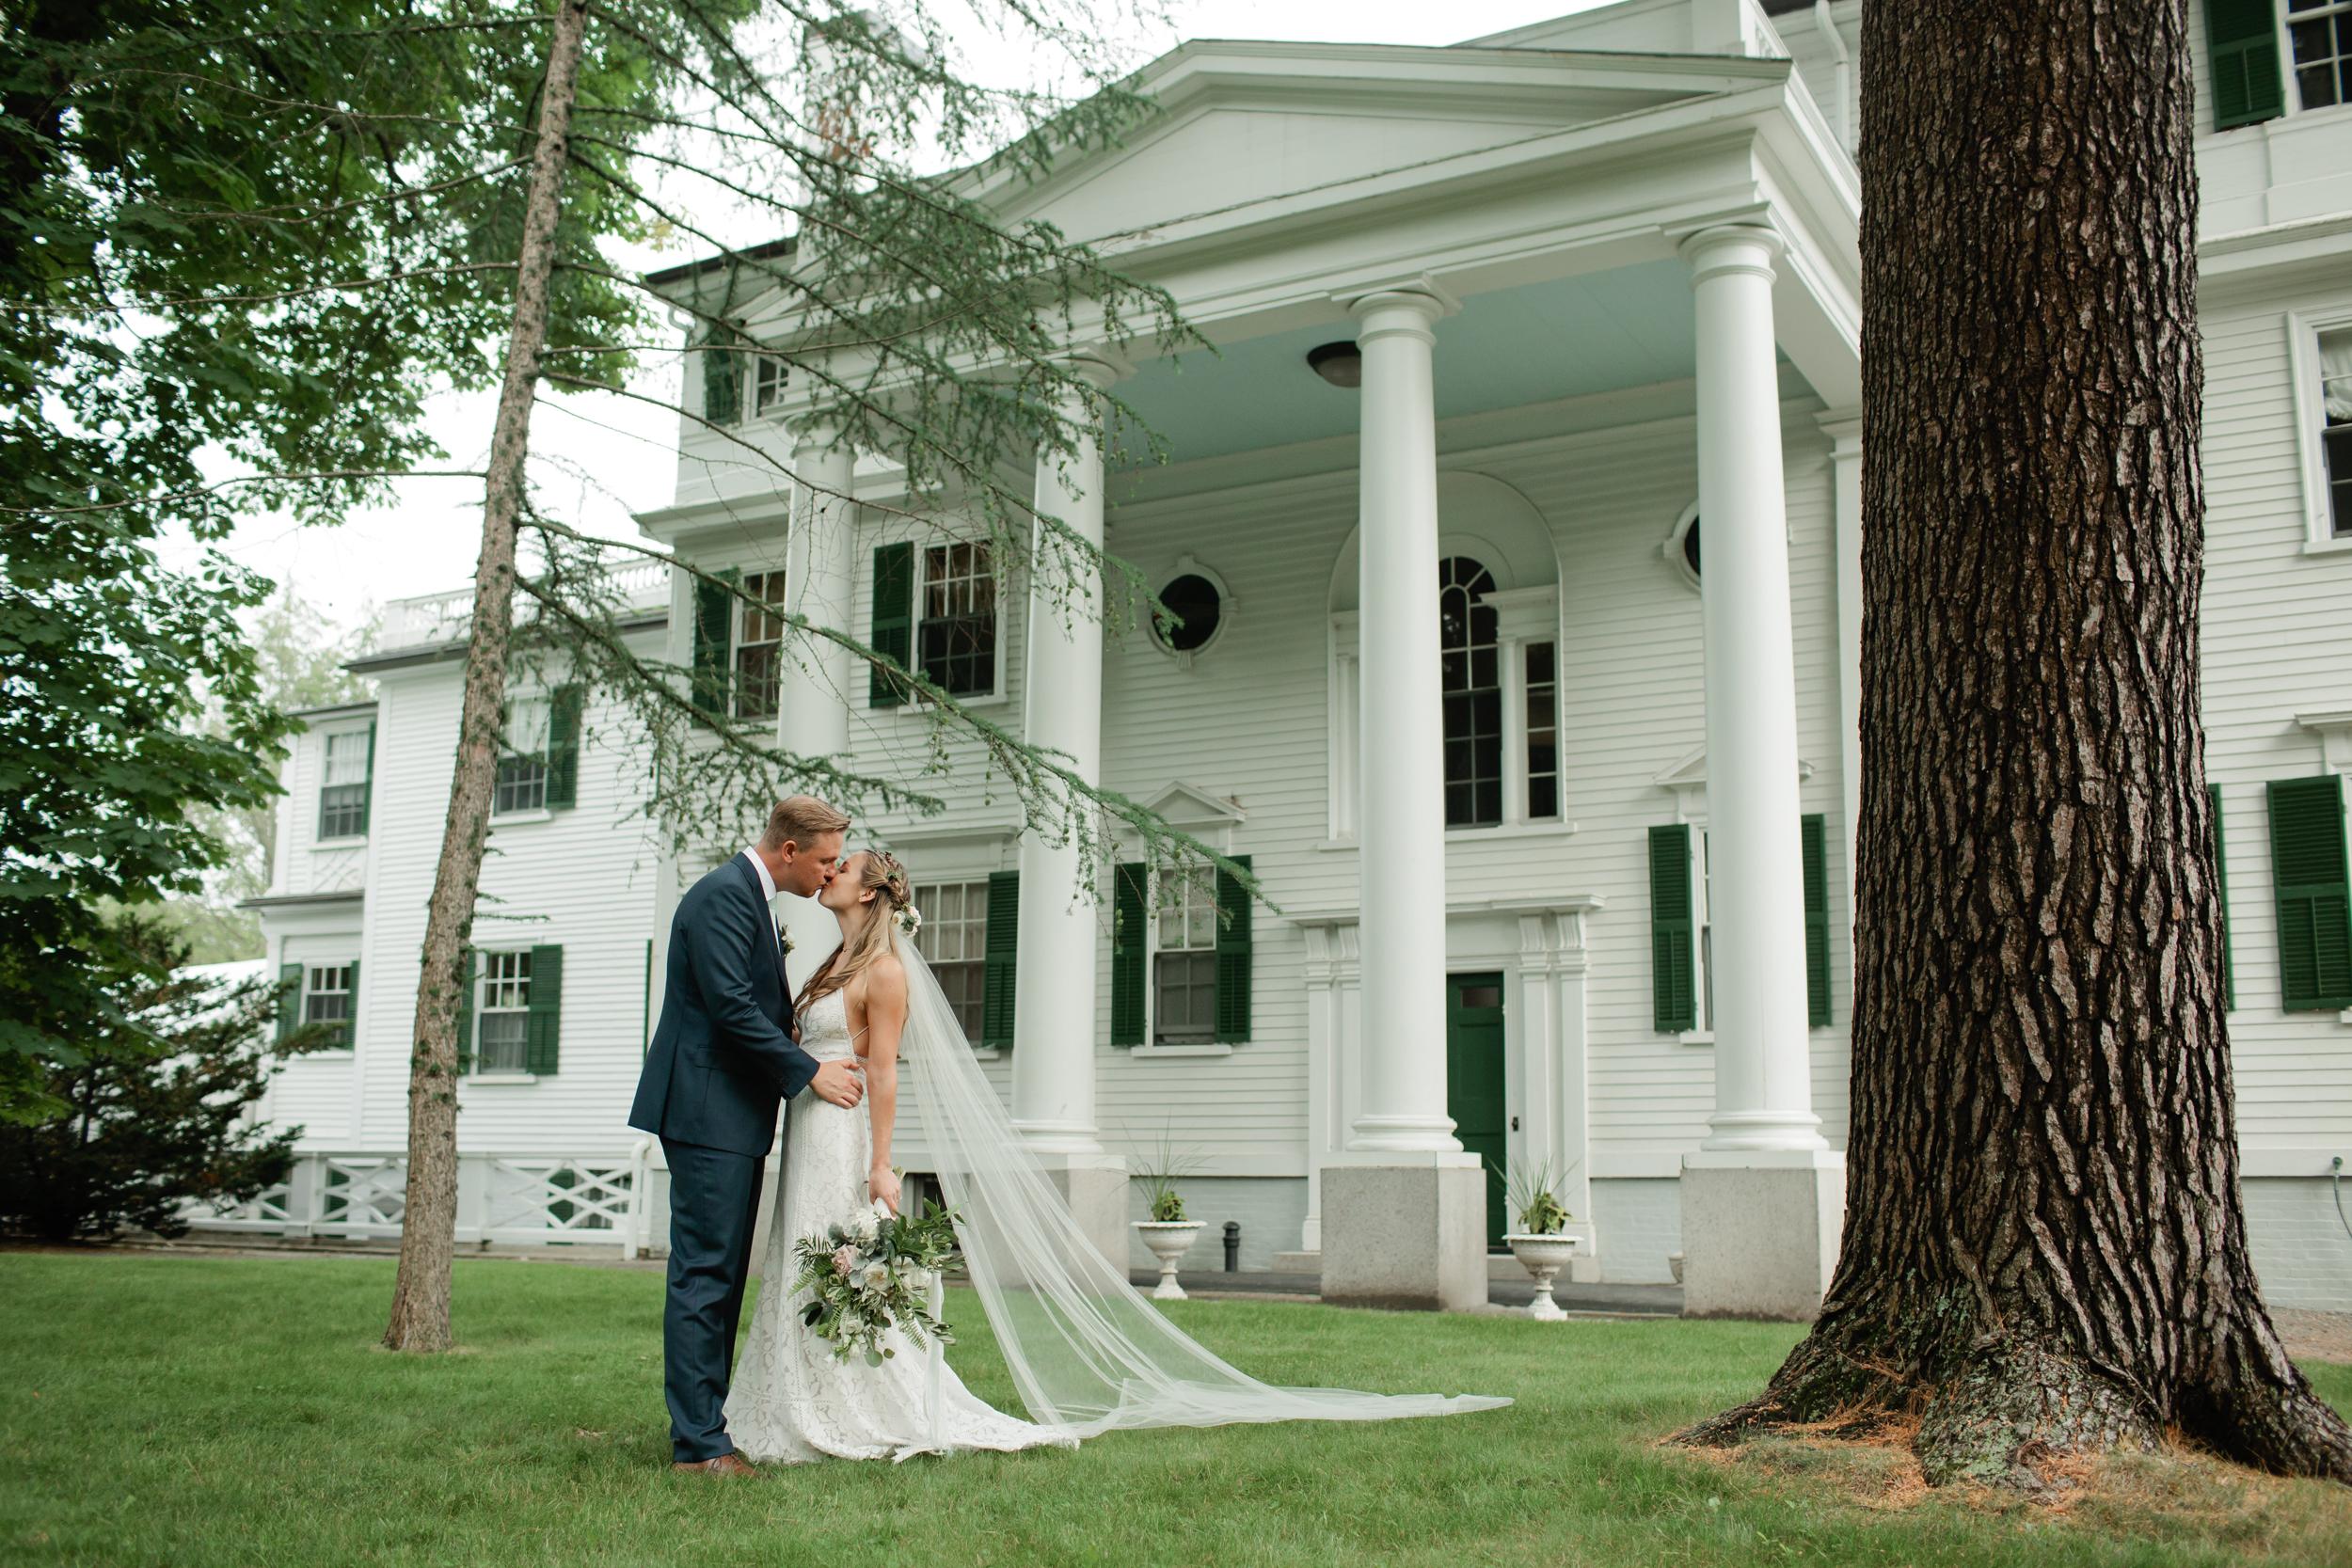 Best-Maine-Wedding-Photographer-146.jpg